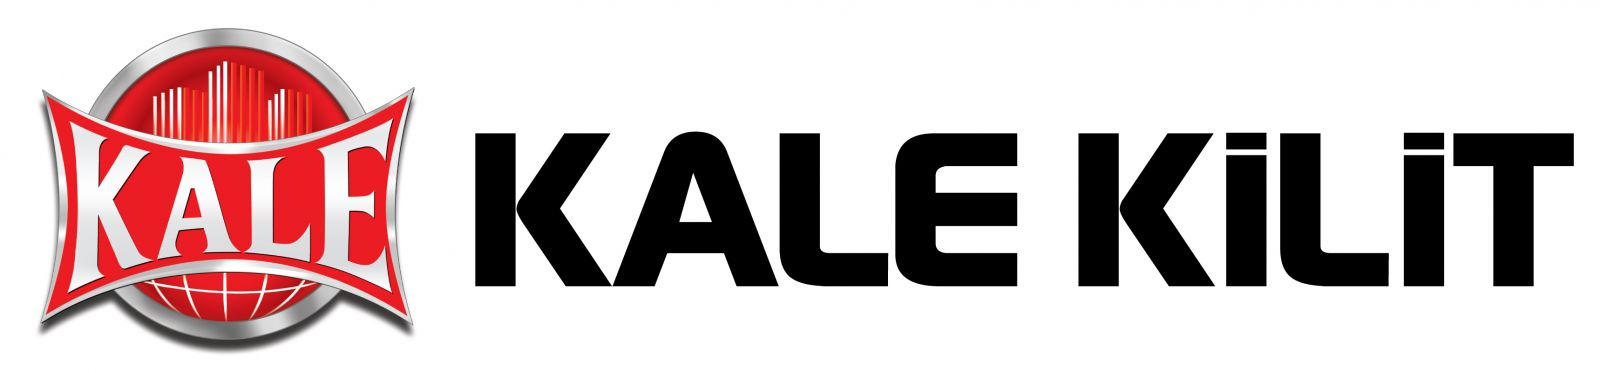 Kale Kilit цилиндры и сердцевины